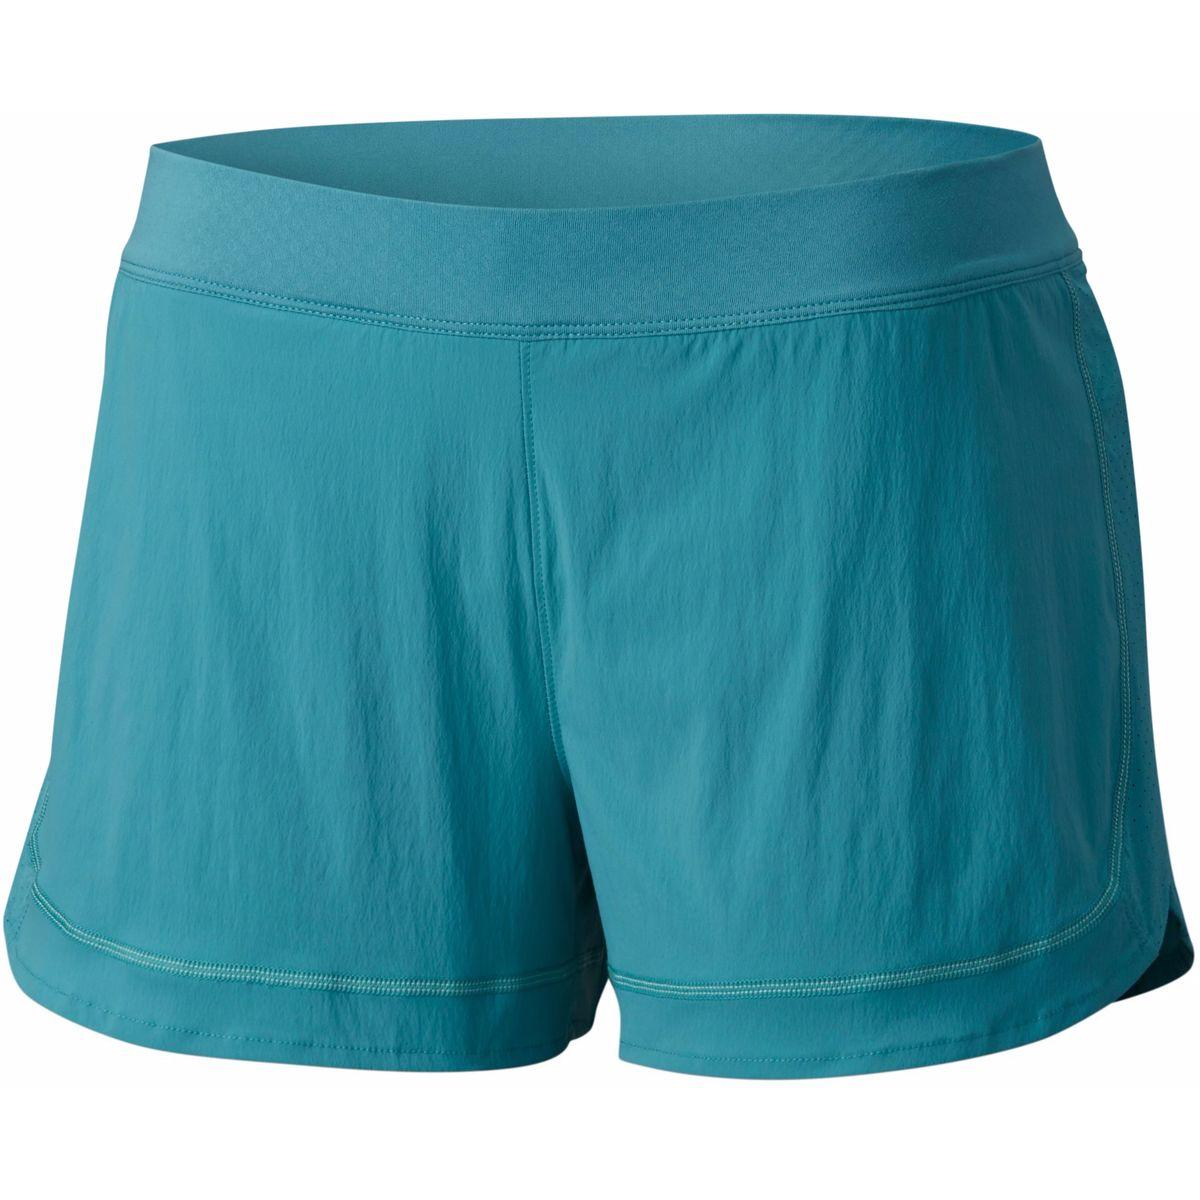 Sale! $41.99 - Columbia Titan Ultra Short